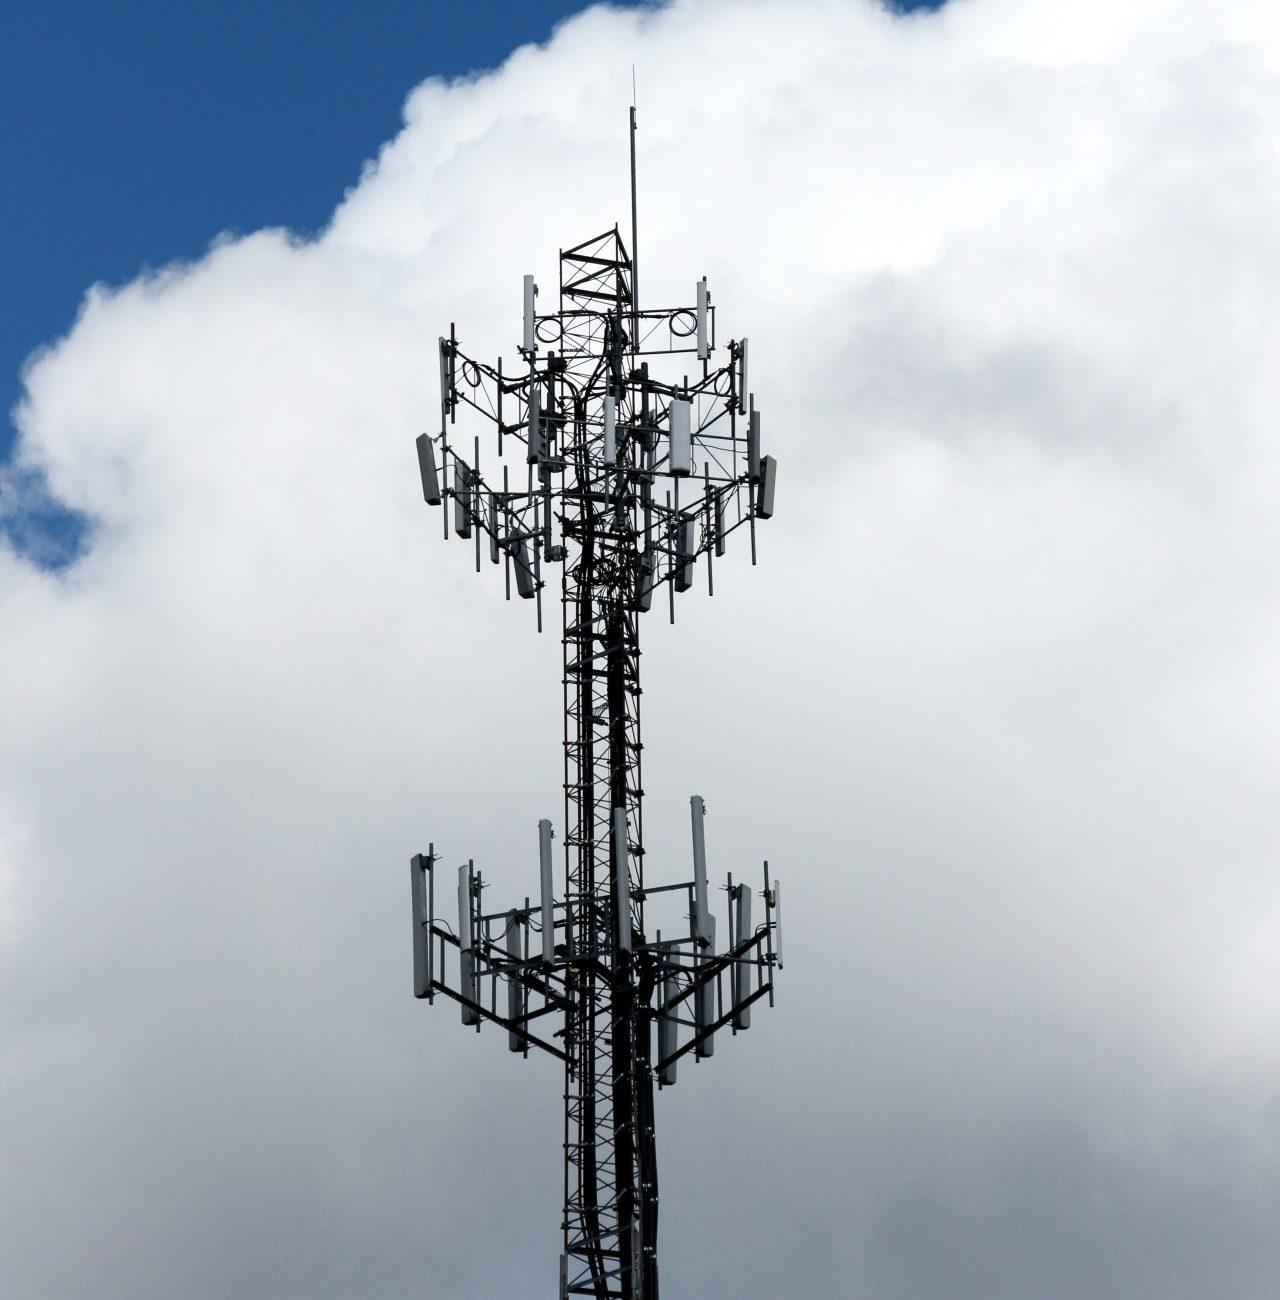 radio-tower-against-cloud